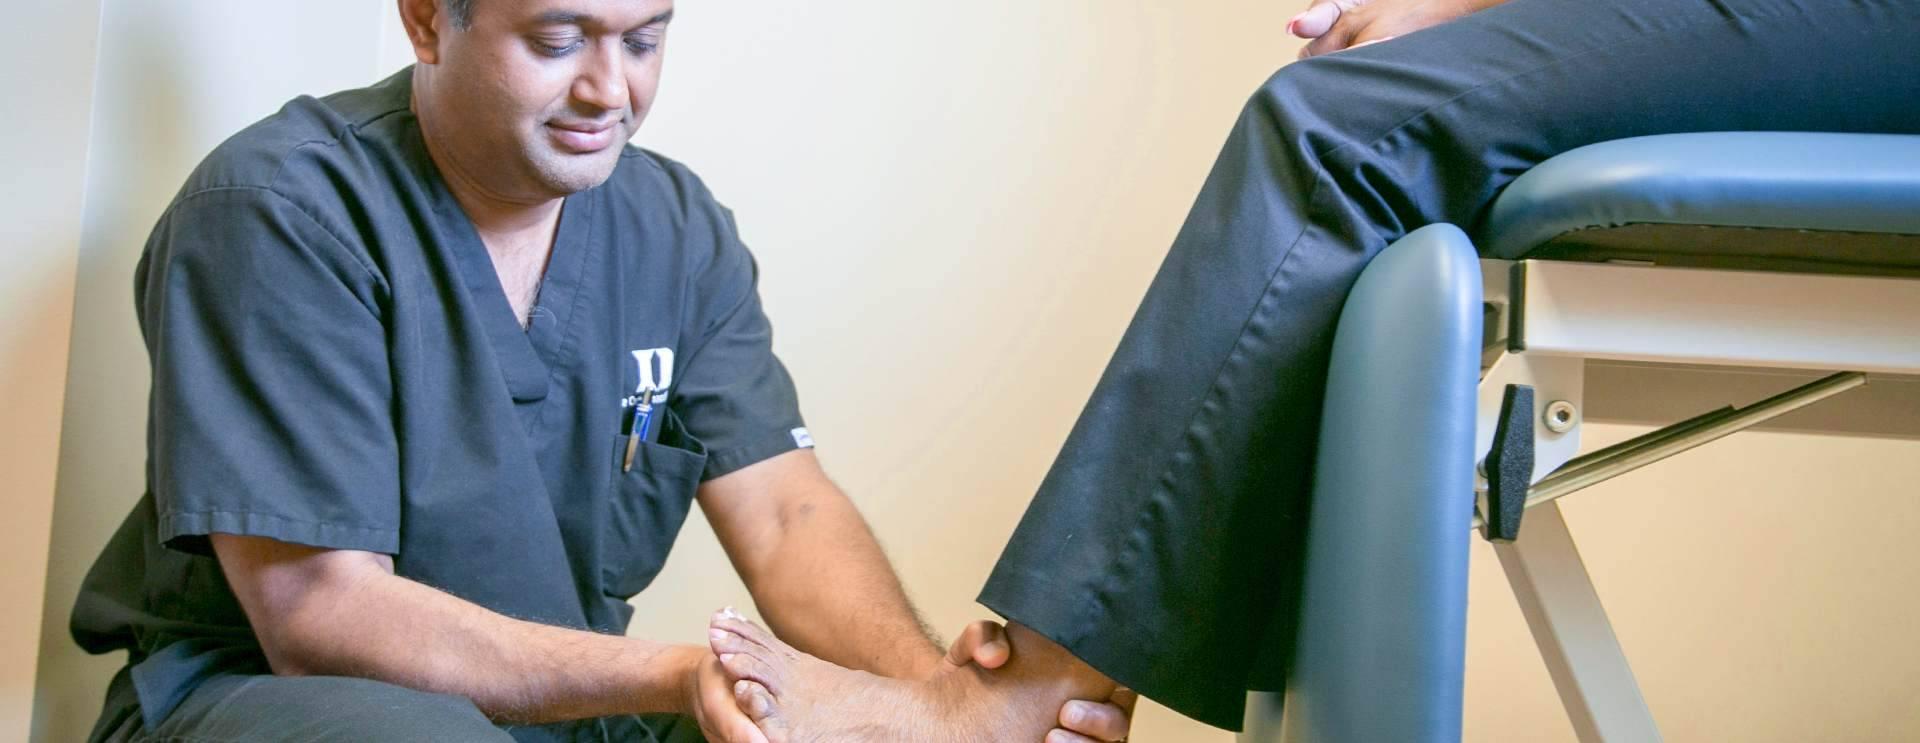 NC Orthopaedic Clinic